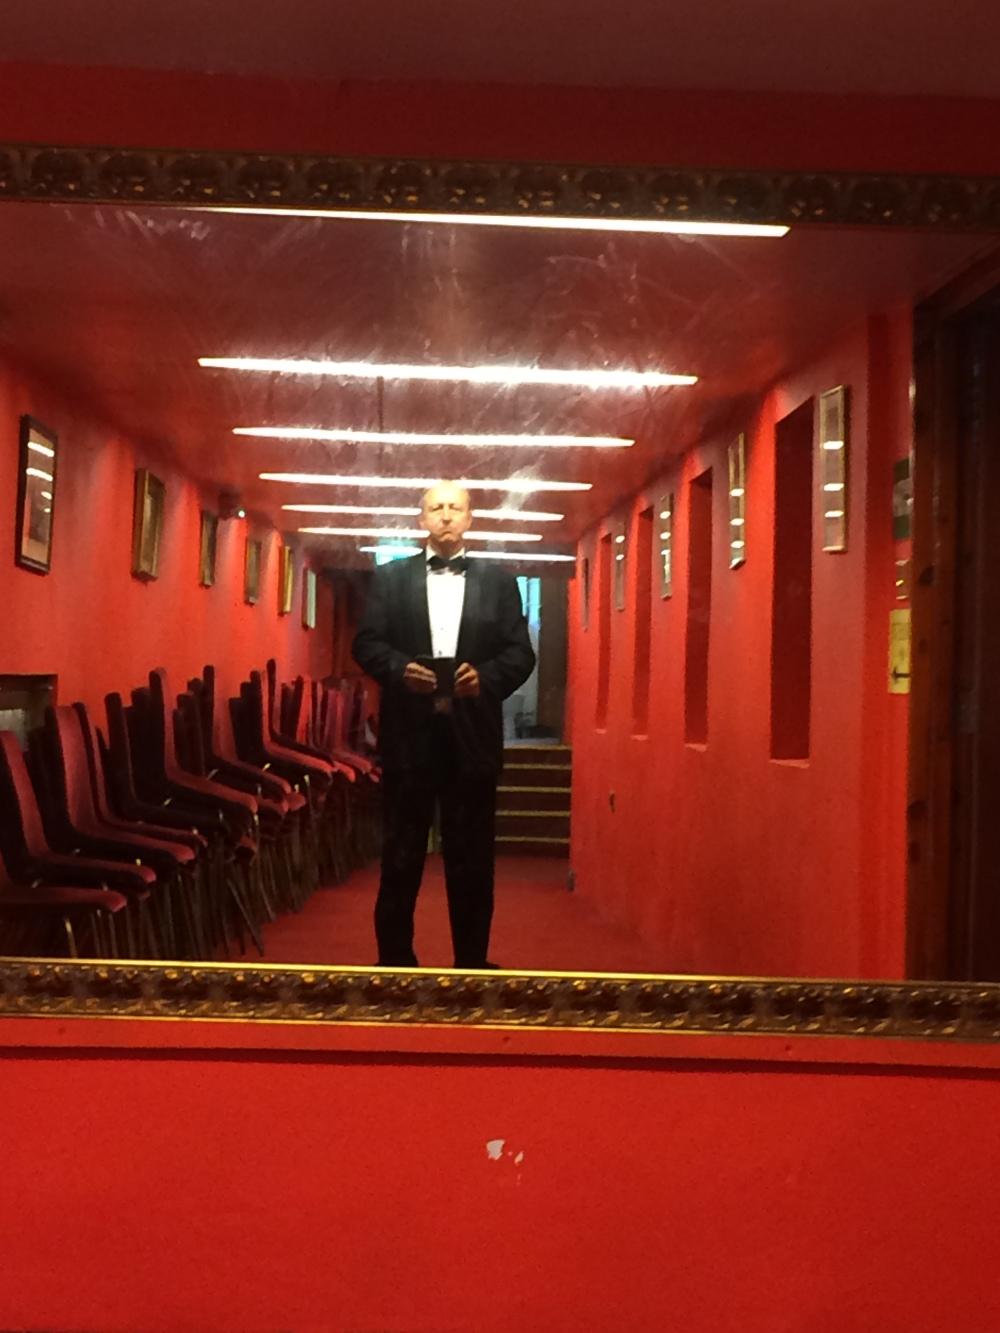 2017 selfie backstage 'House Red'